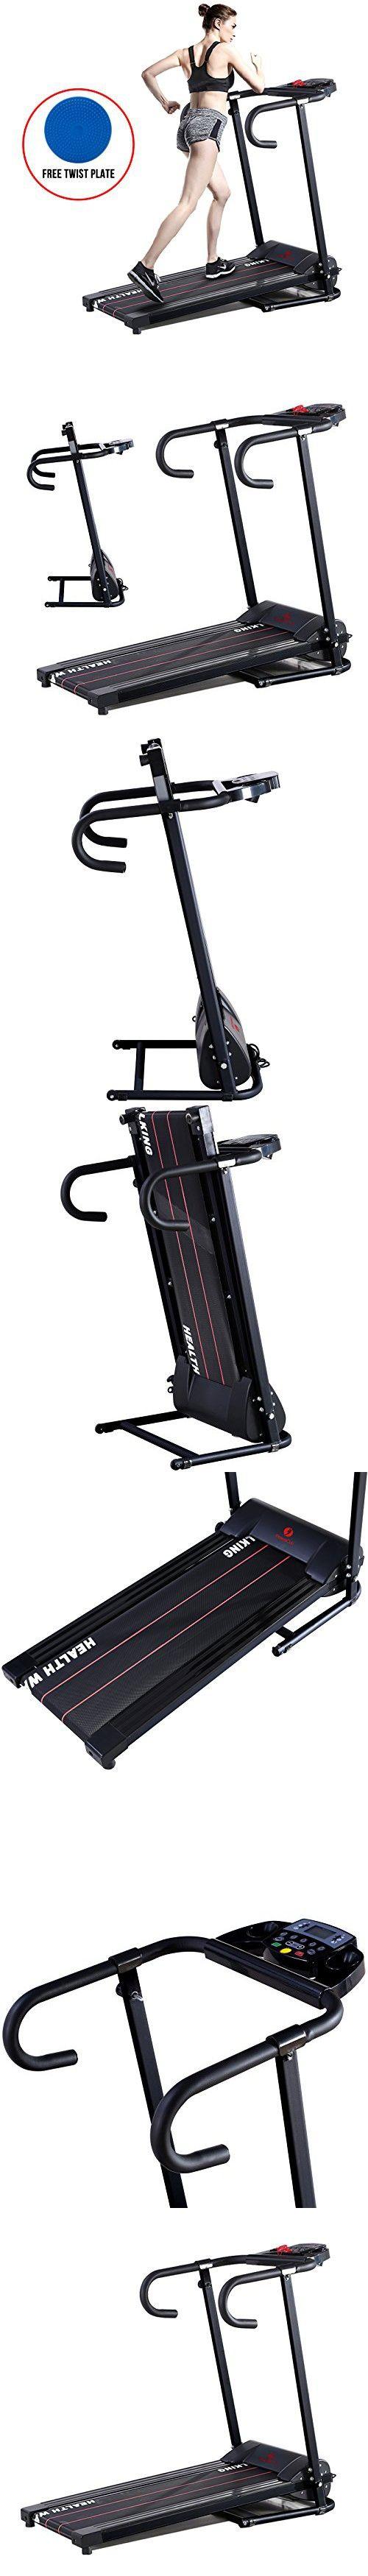 H.B.S Portable Folding Electrical Running Machine Motorized Treadmill Home Gym Running Machine Black